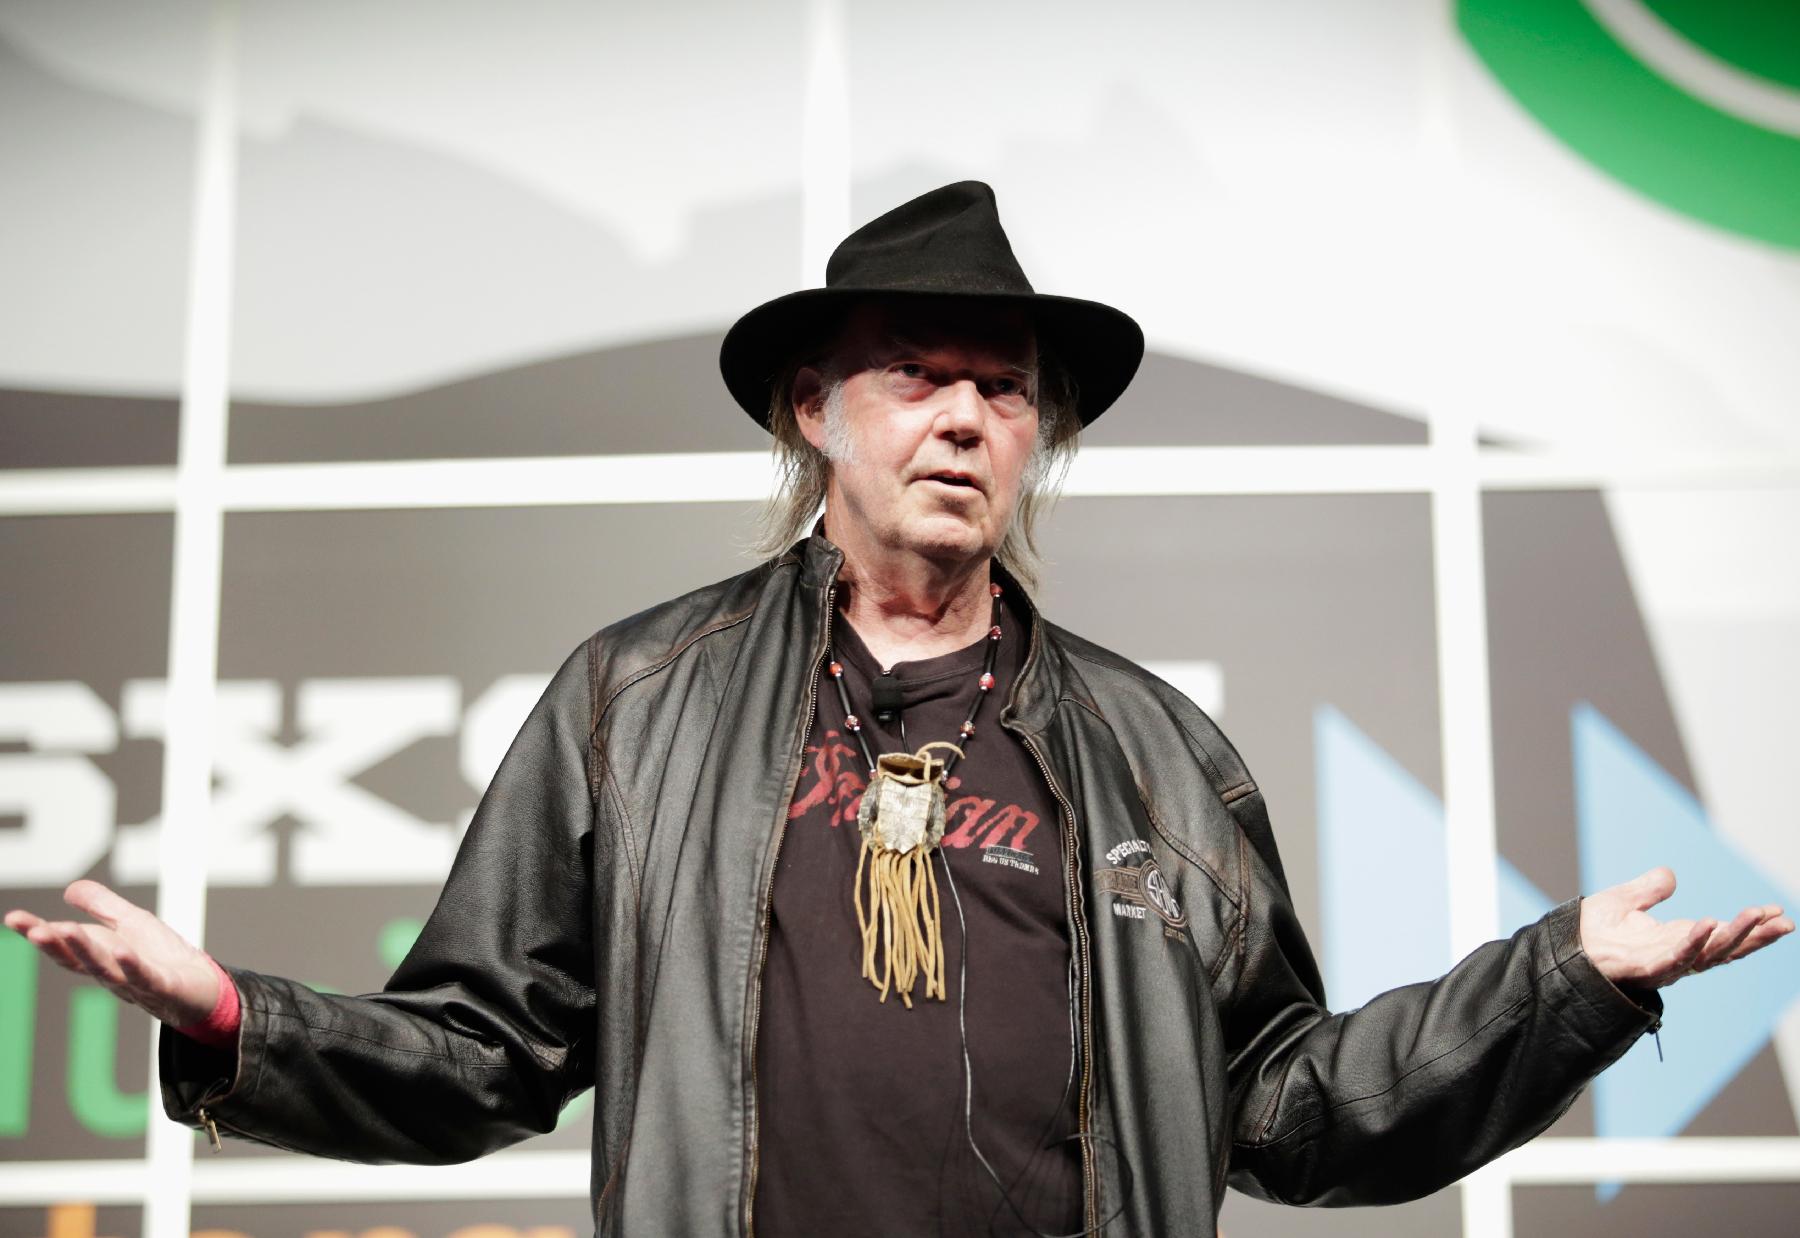 Neil Young Reaches $800,000 Pono Kickstarter Goal in 1 Day